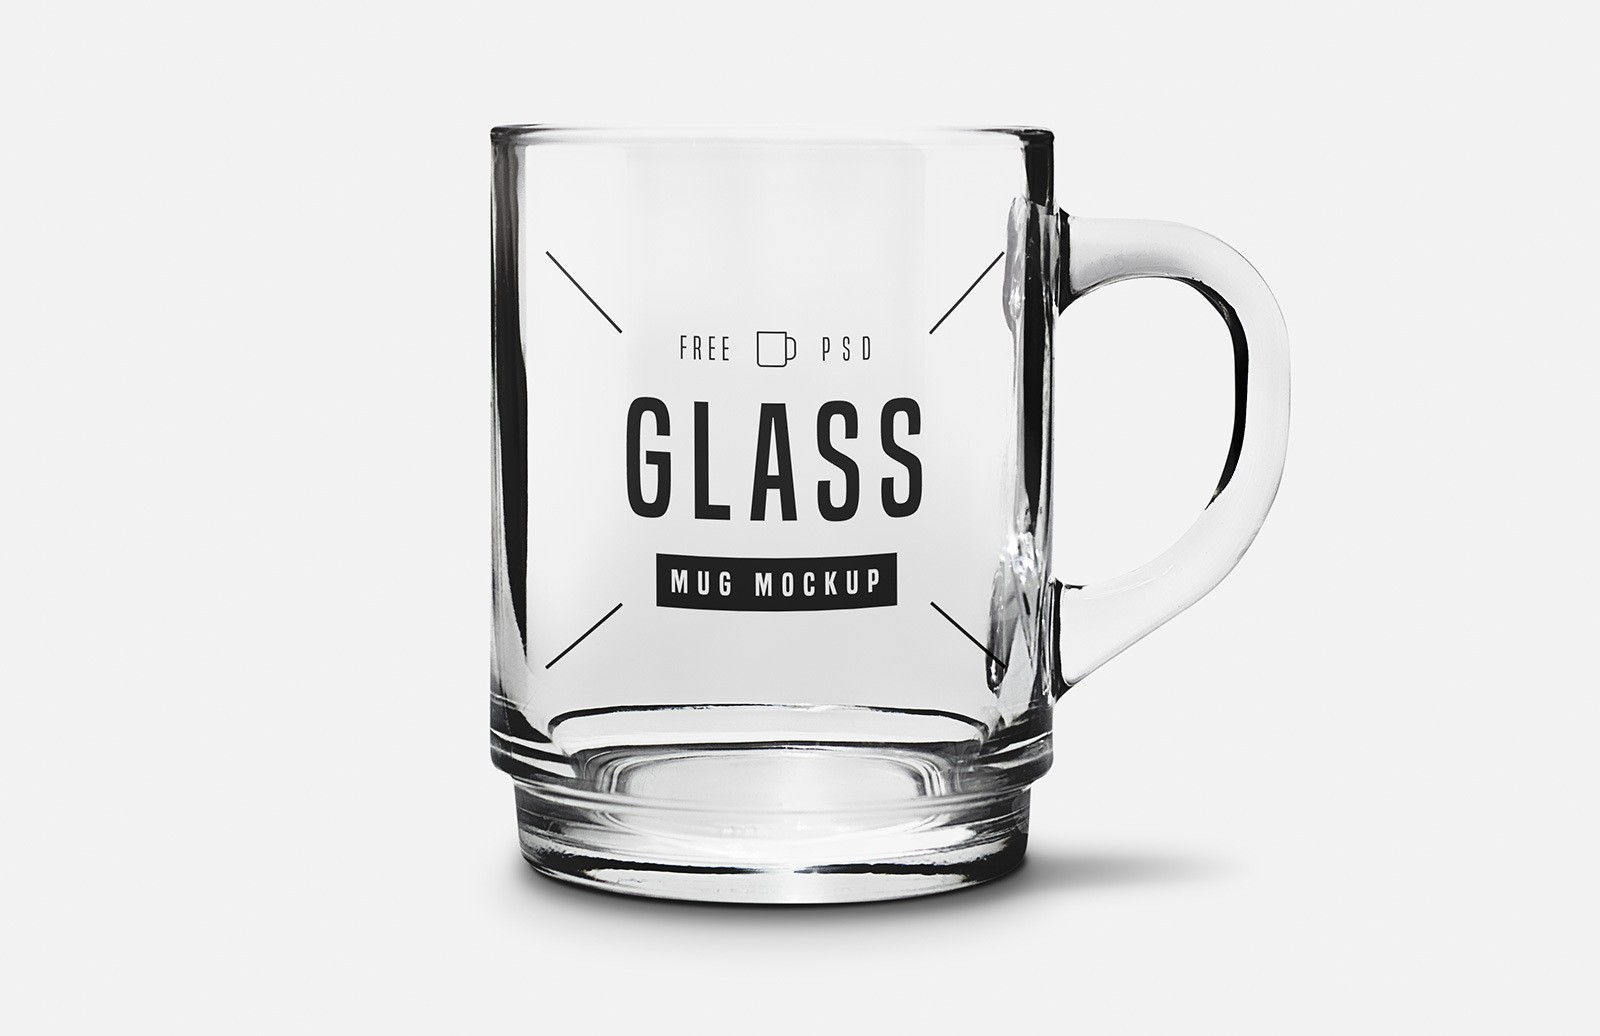 Free Glass Mug Mockup